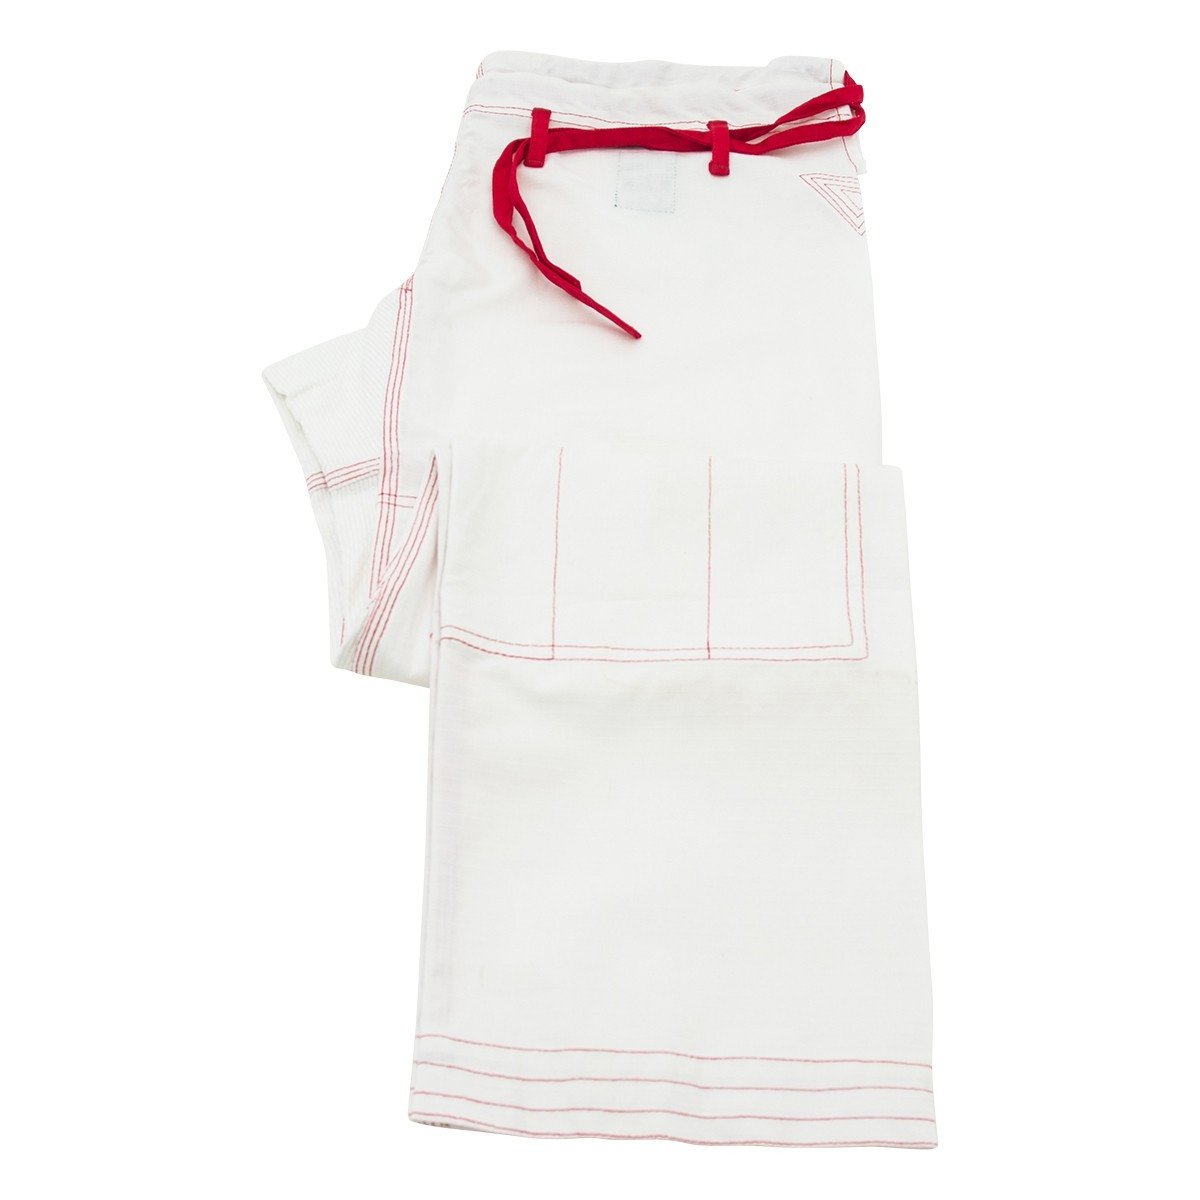 Kimono JJB Pro Shield Blanc Femme